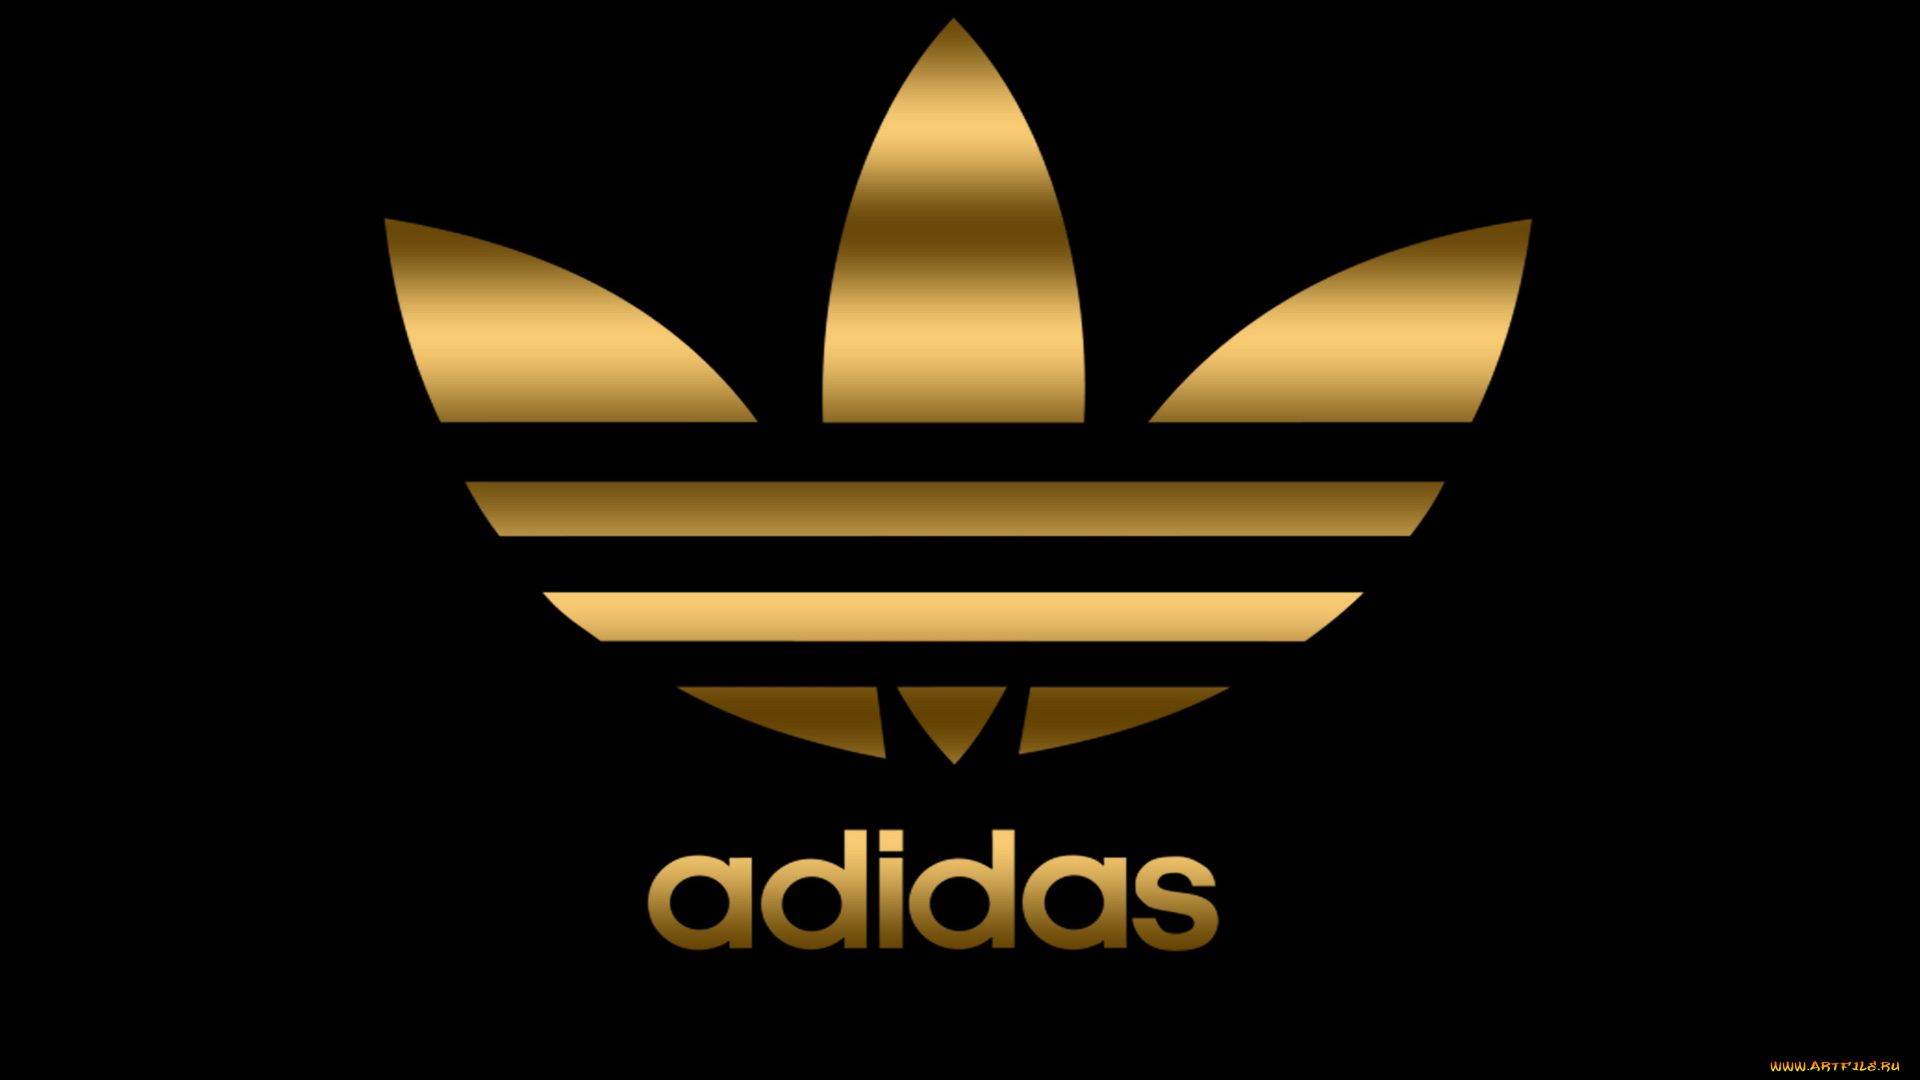 Wallpaper Adidas Gold